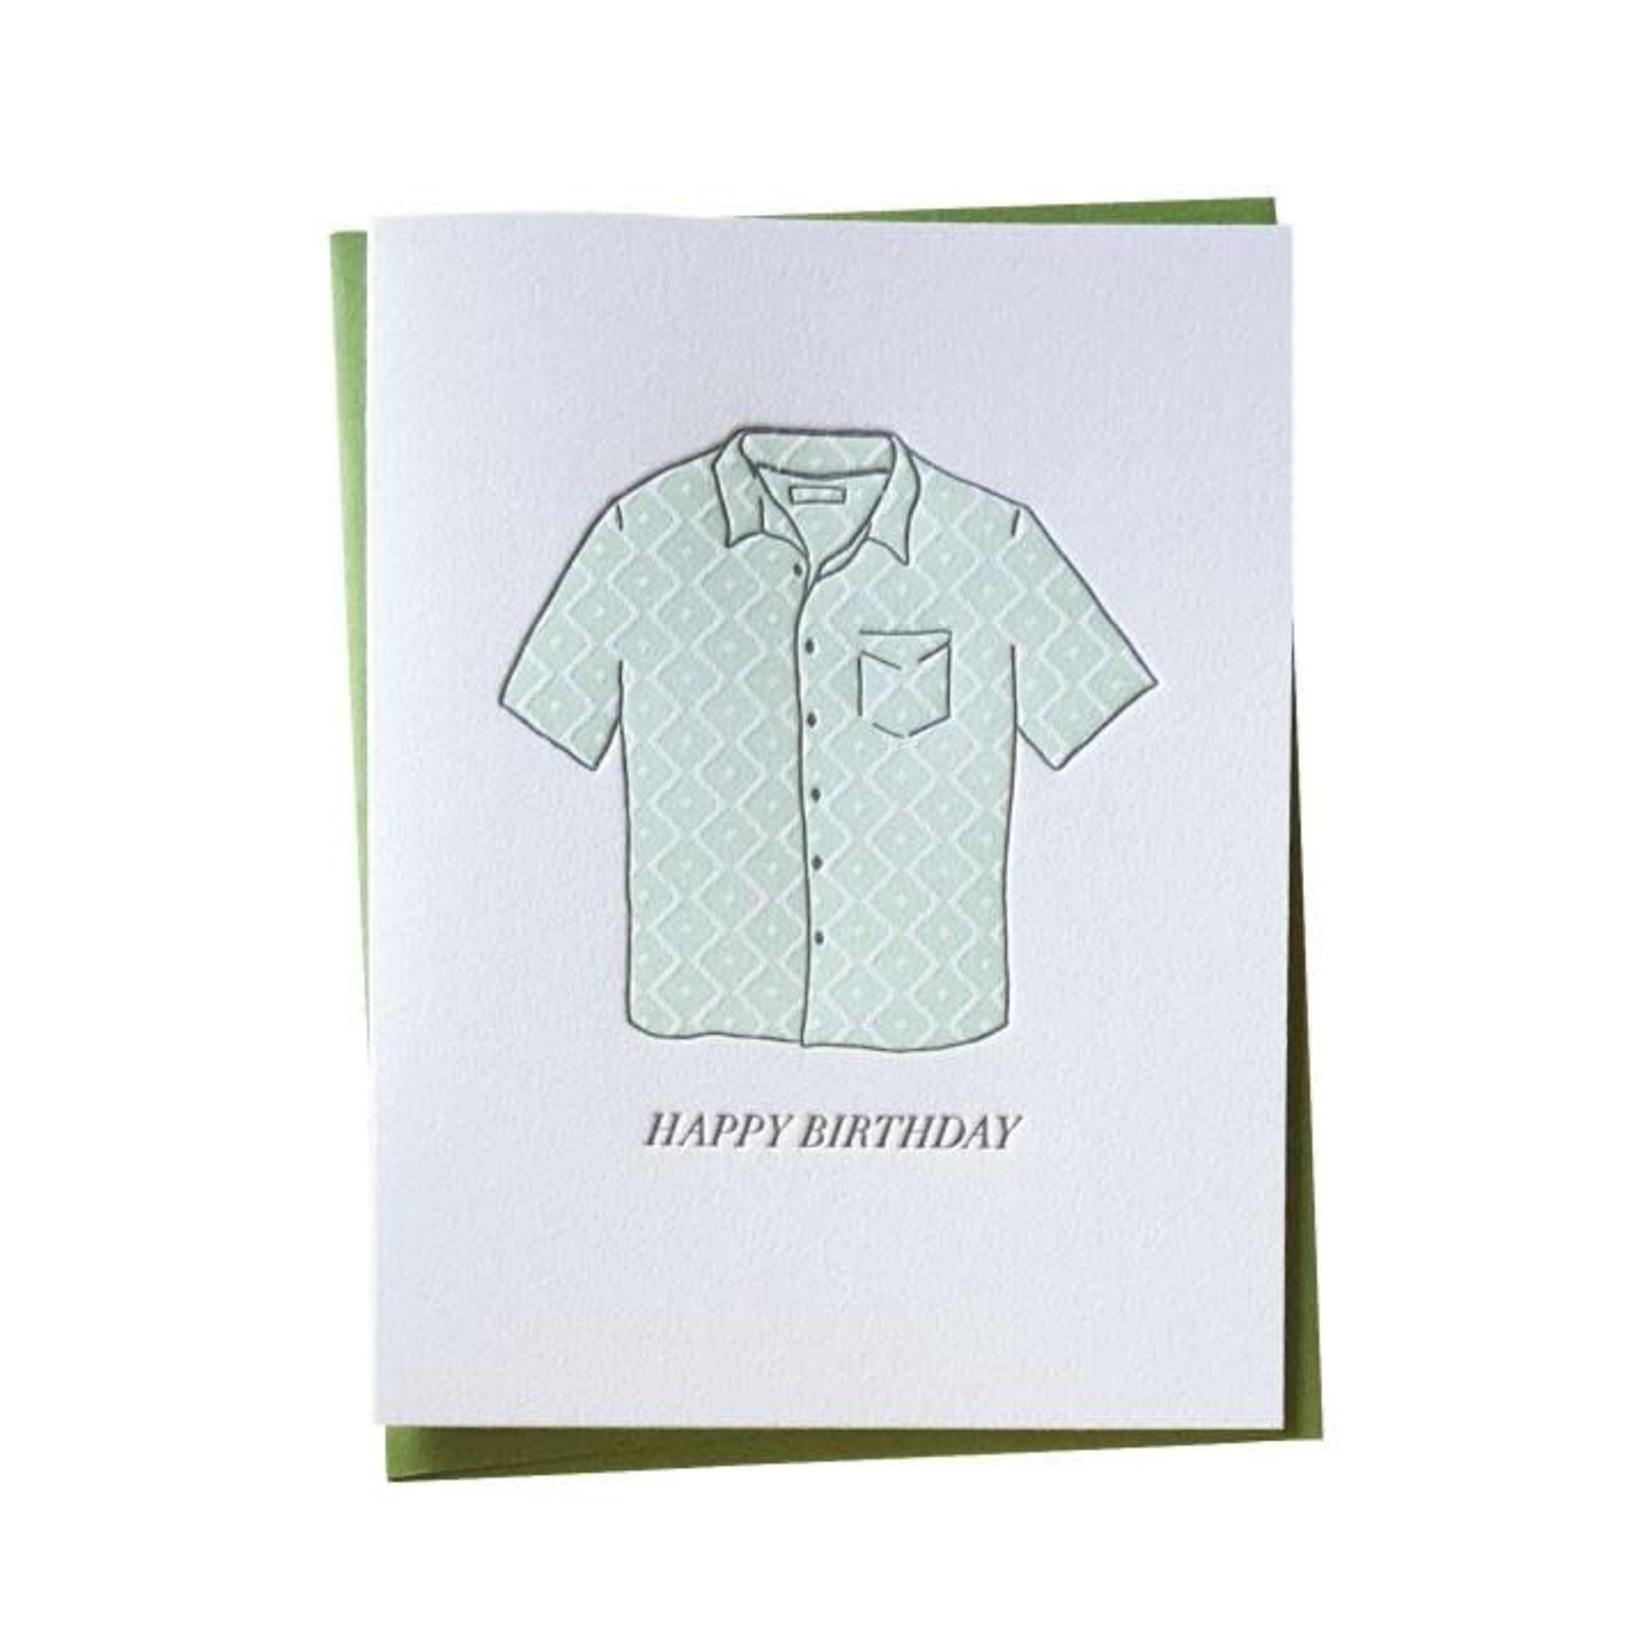 Bradley & Lily A2 Aloha Shirt Birthday Letterpress Folded Single Card